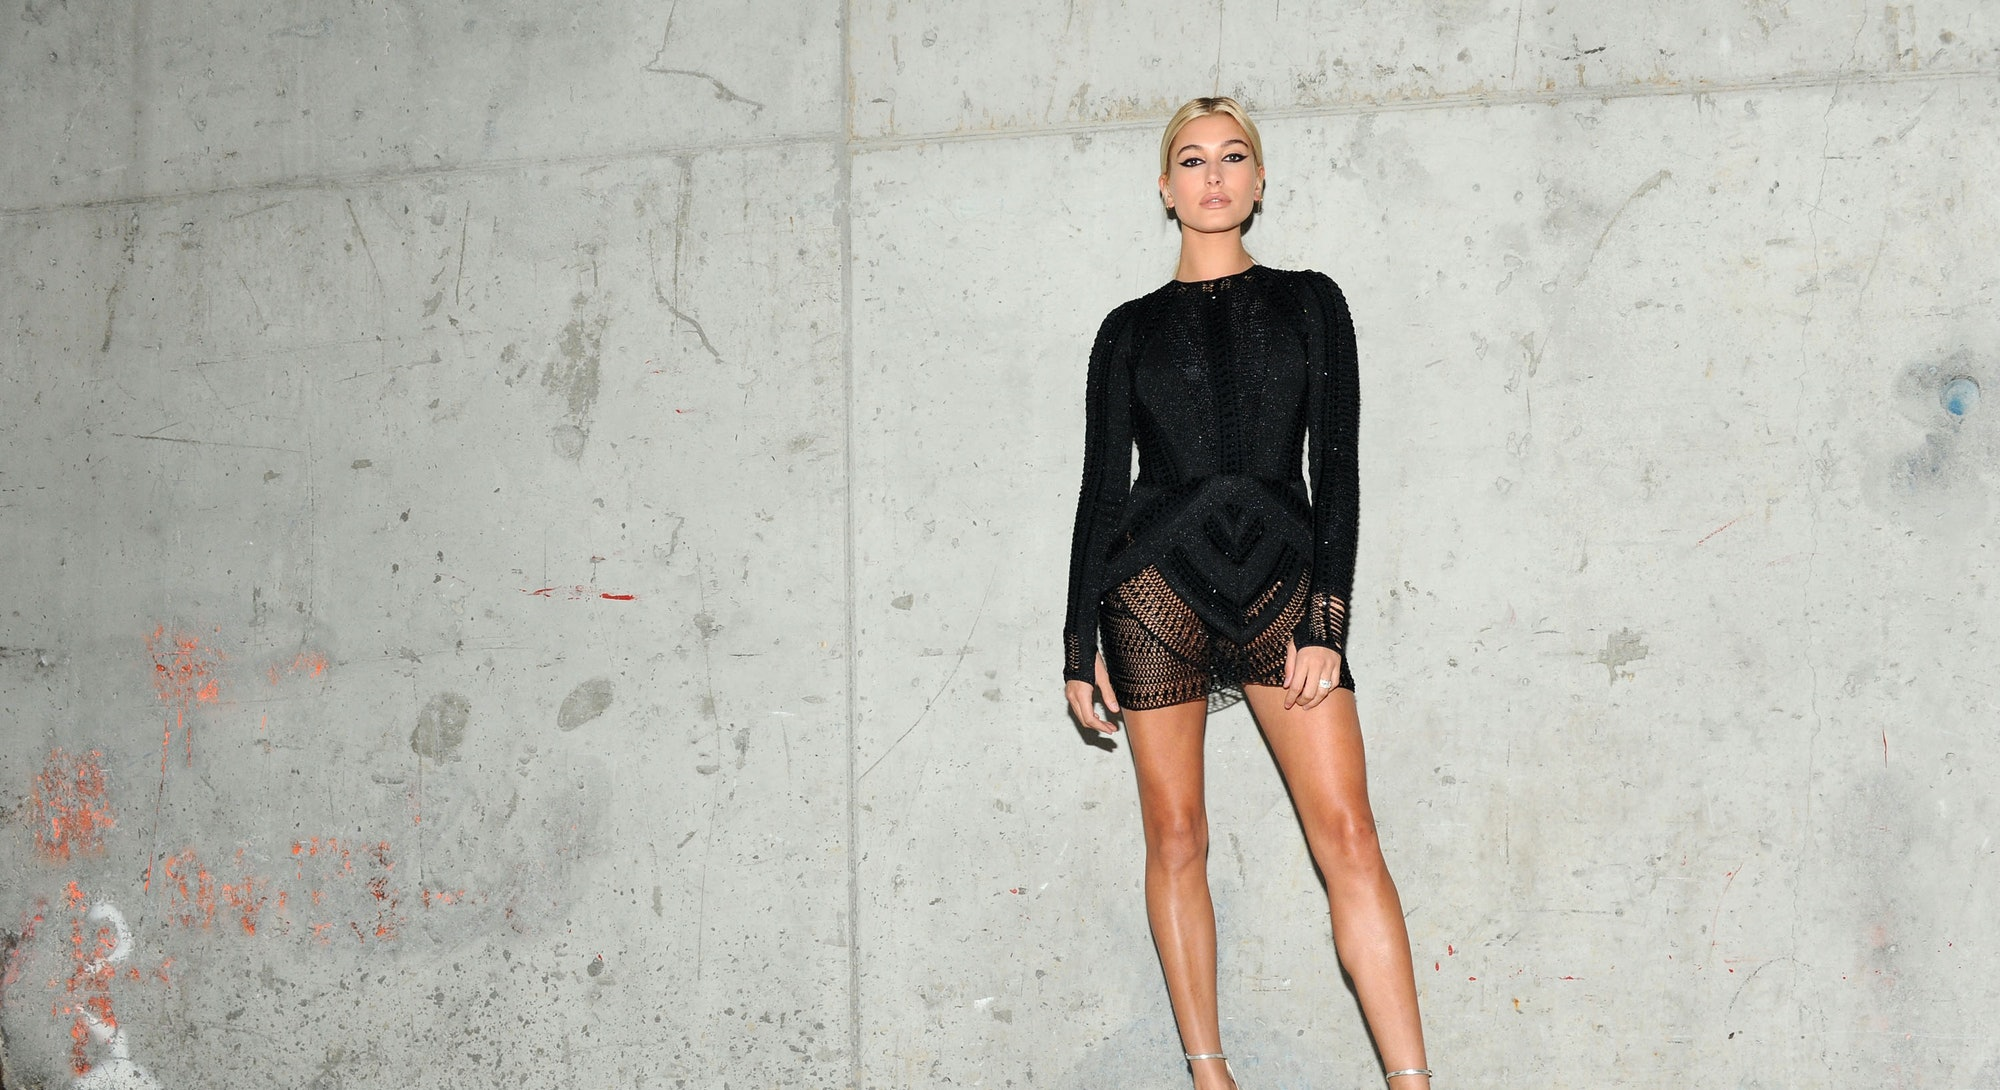 Hailey Bieber '90s Fashion Looks